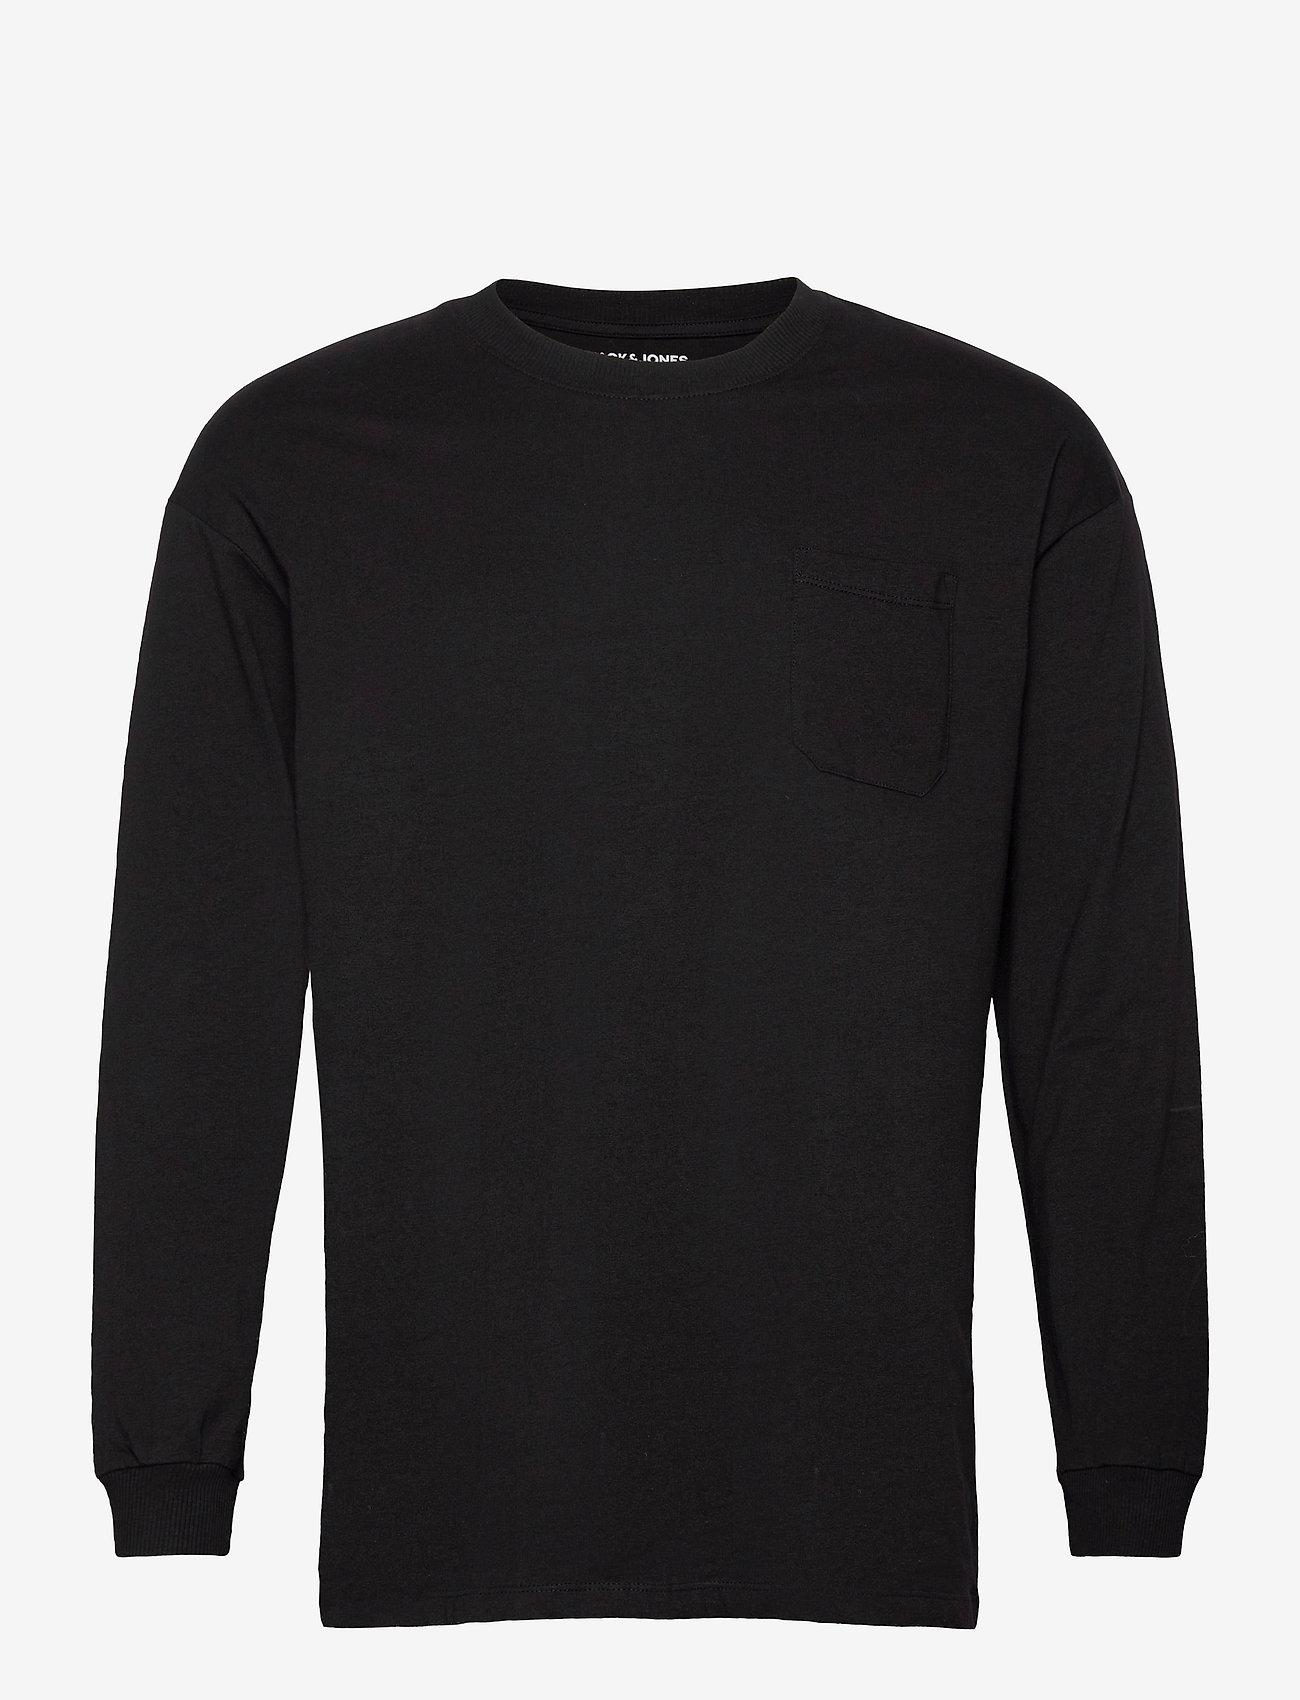 Jack & Jones - JORBRINK TEE LS CREW NECK - basic t-shirts - black - 0